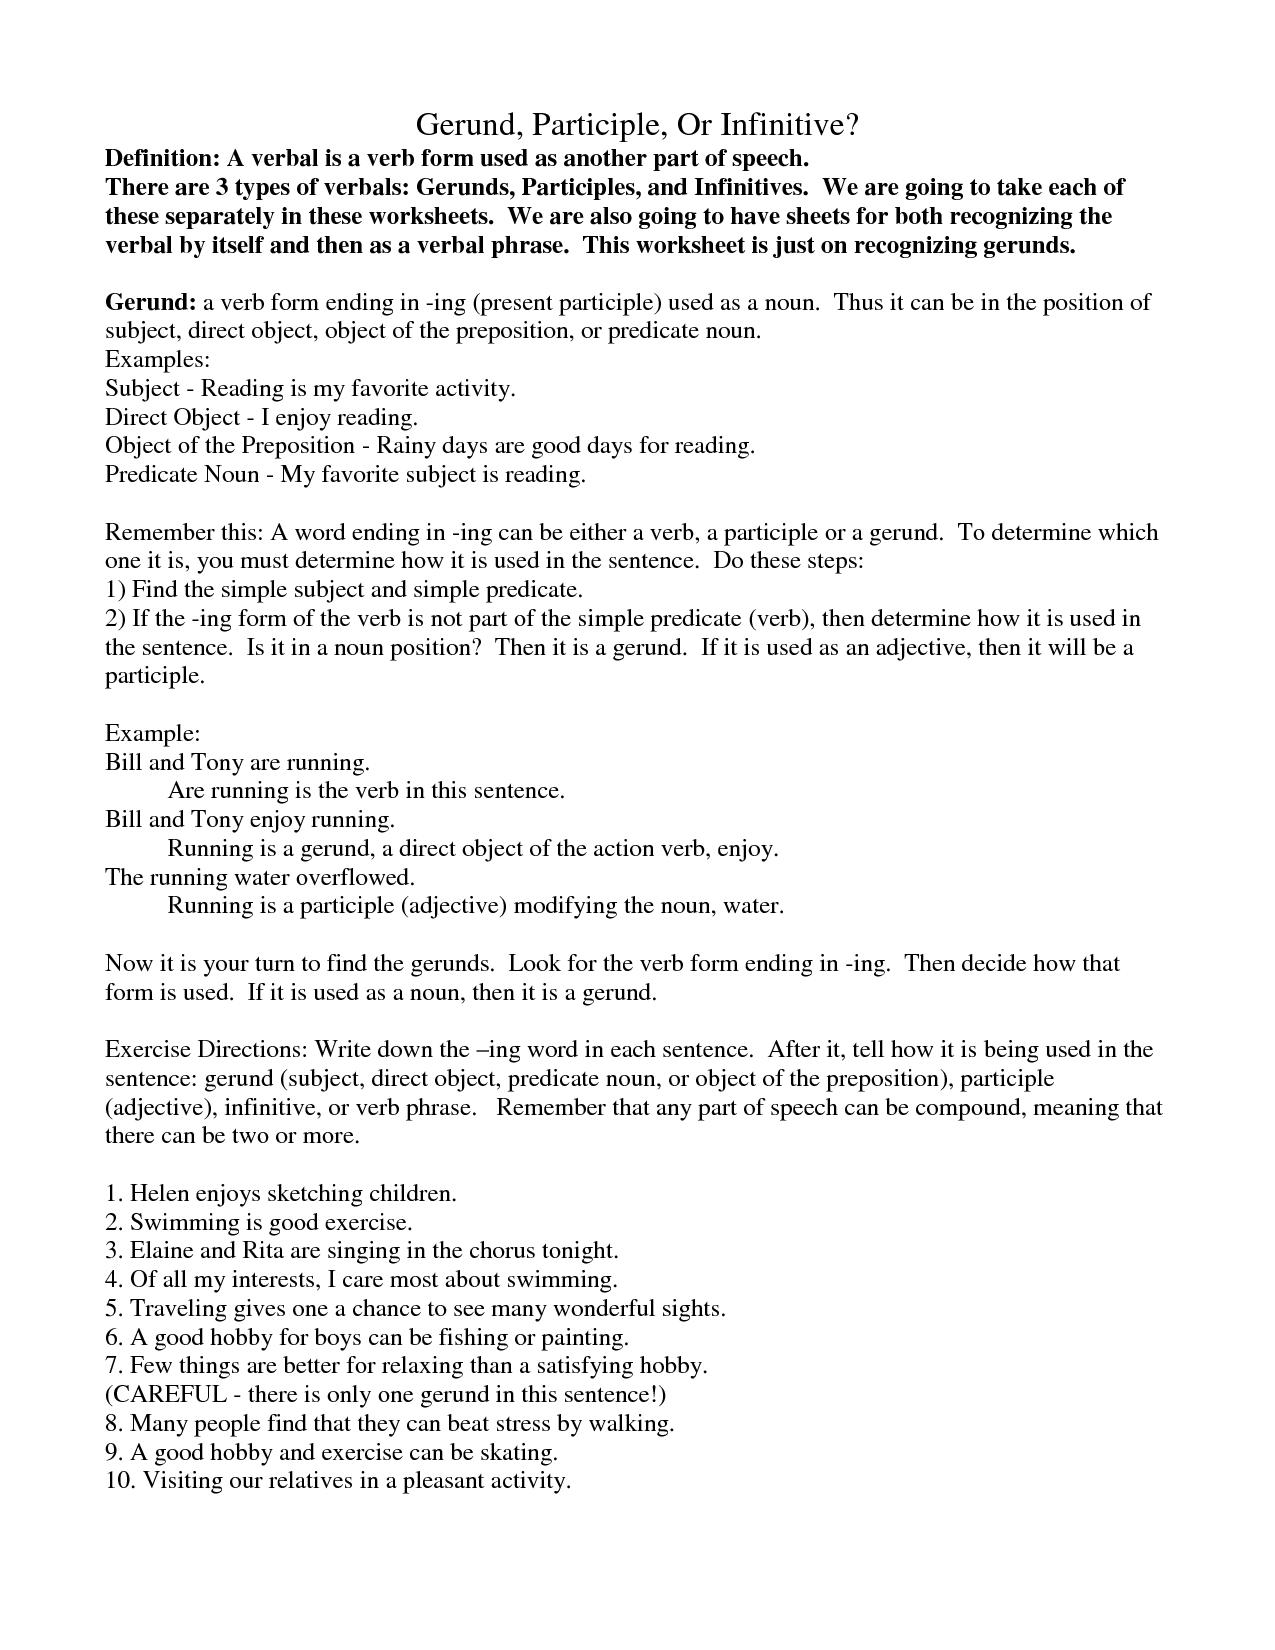 Identifying Participles Worksheet